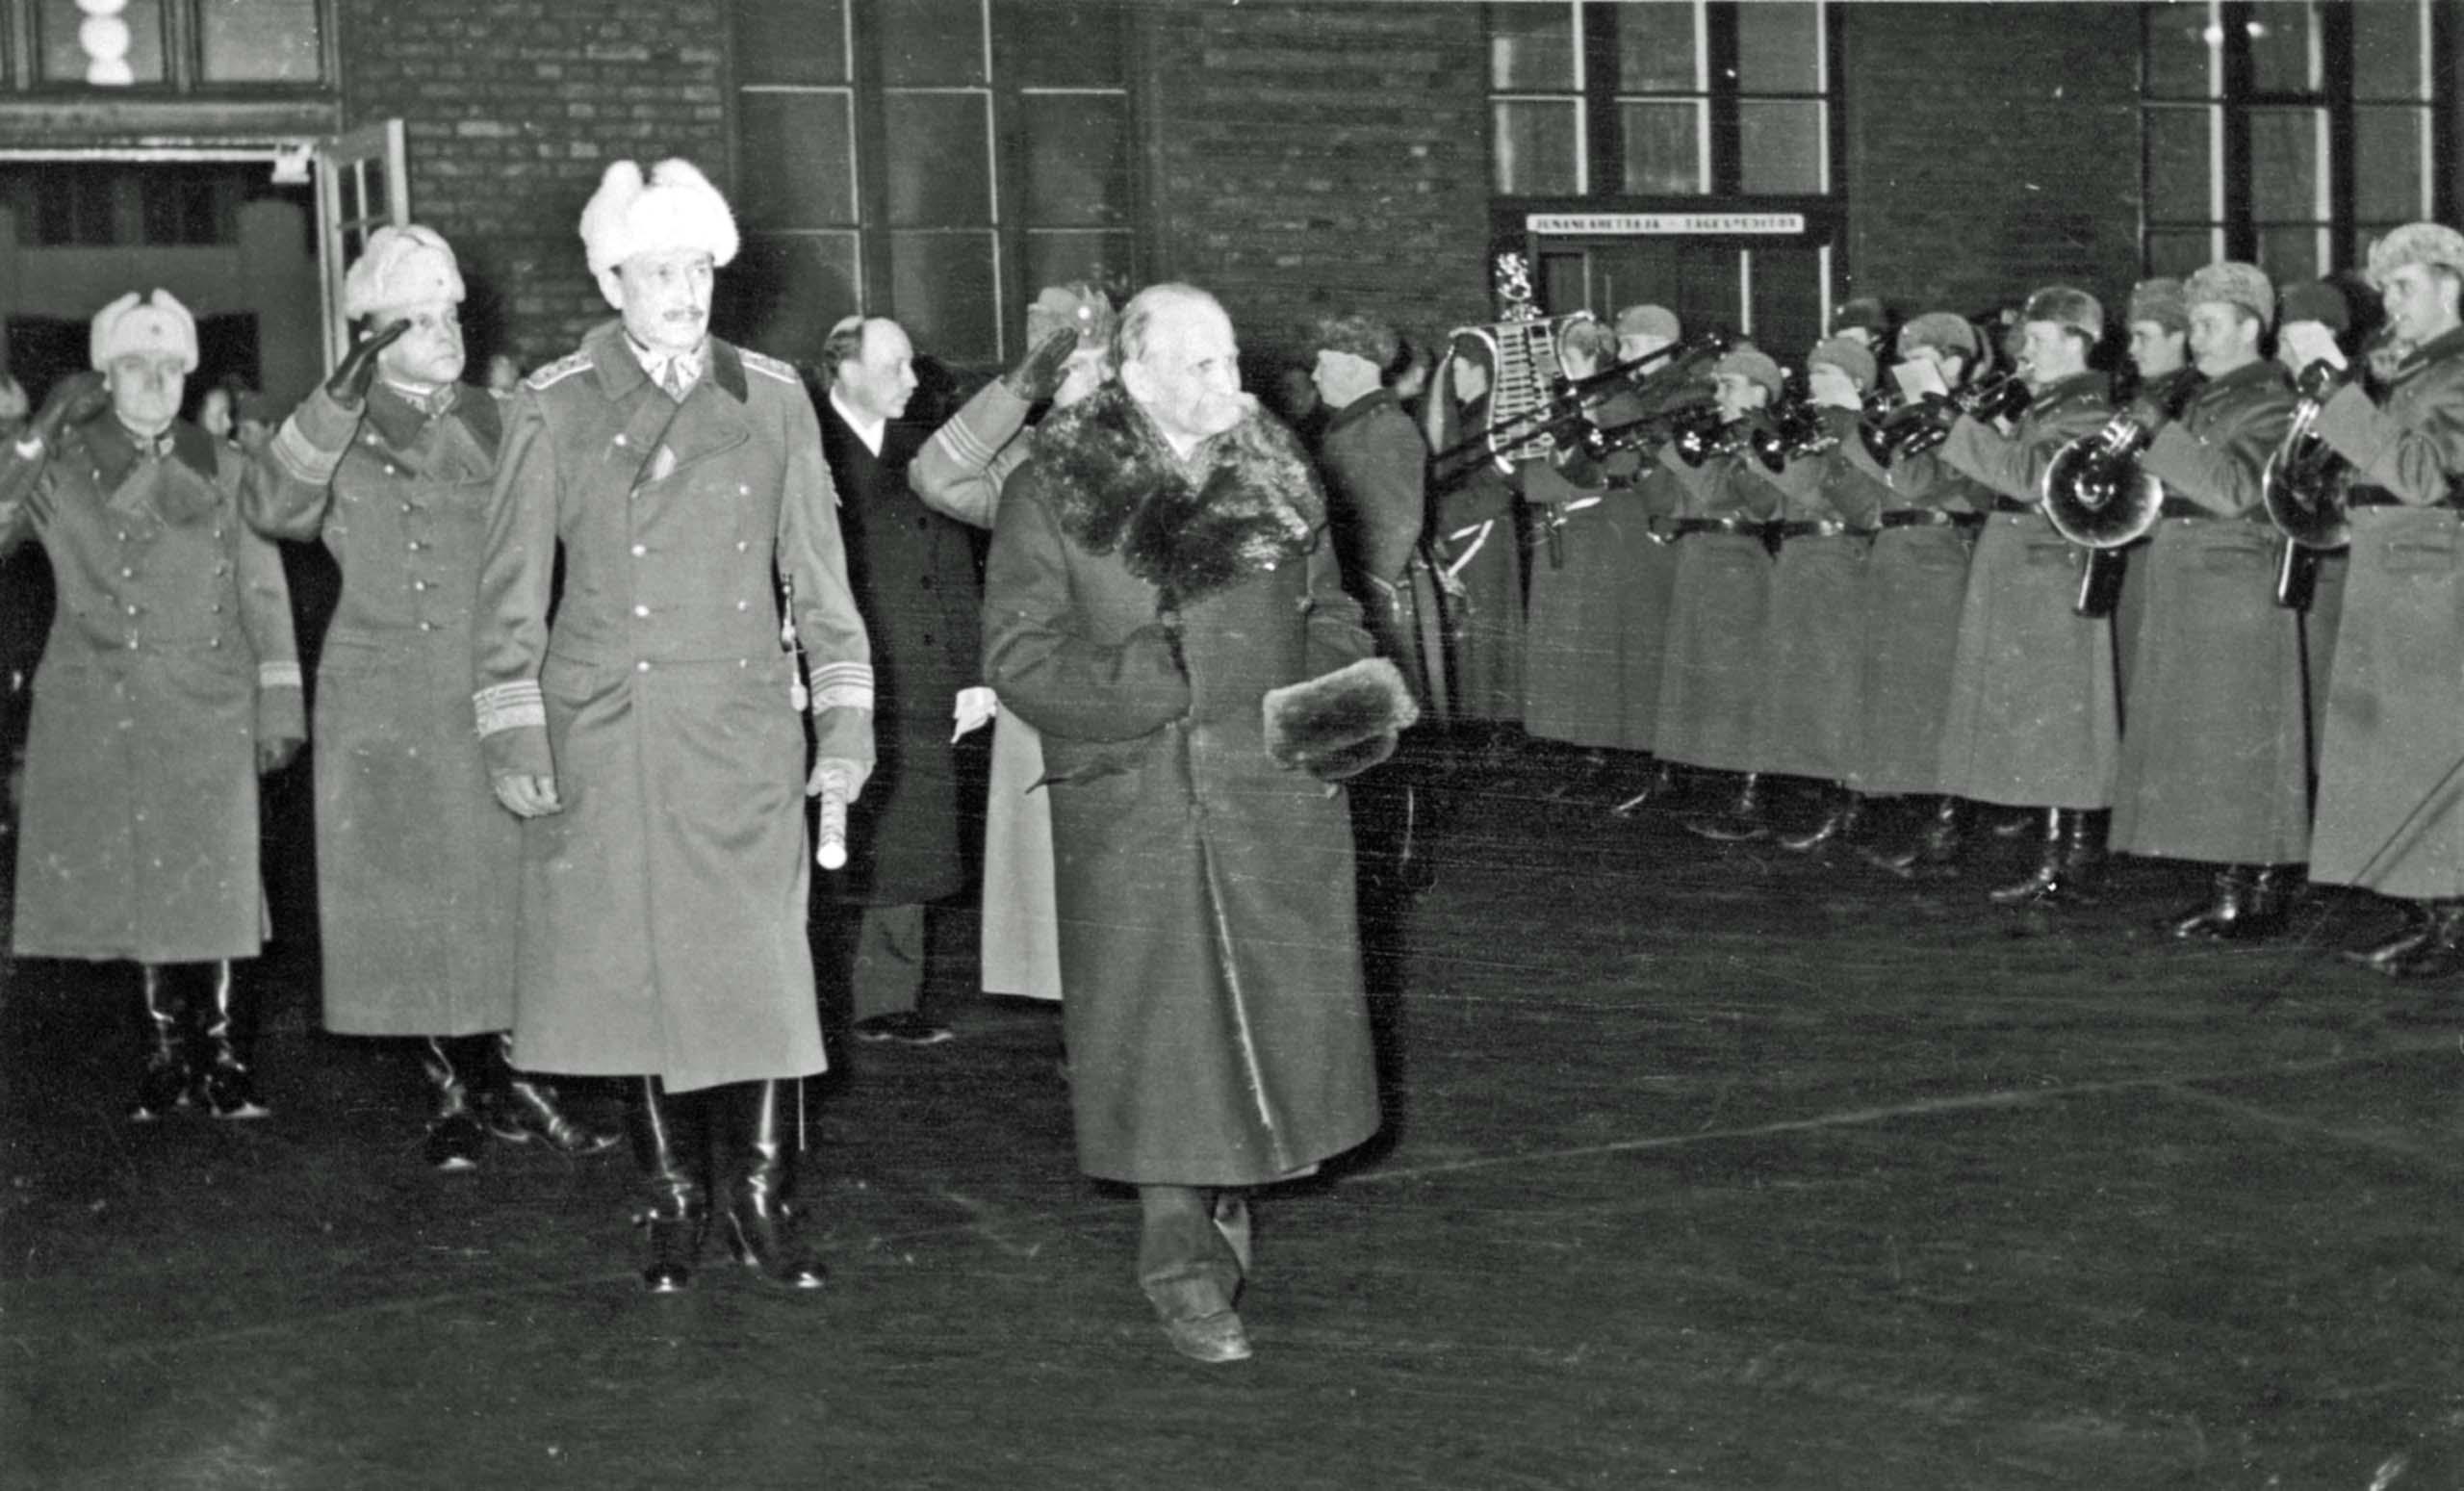 Kyusti Kallio, Carl Mannerheim